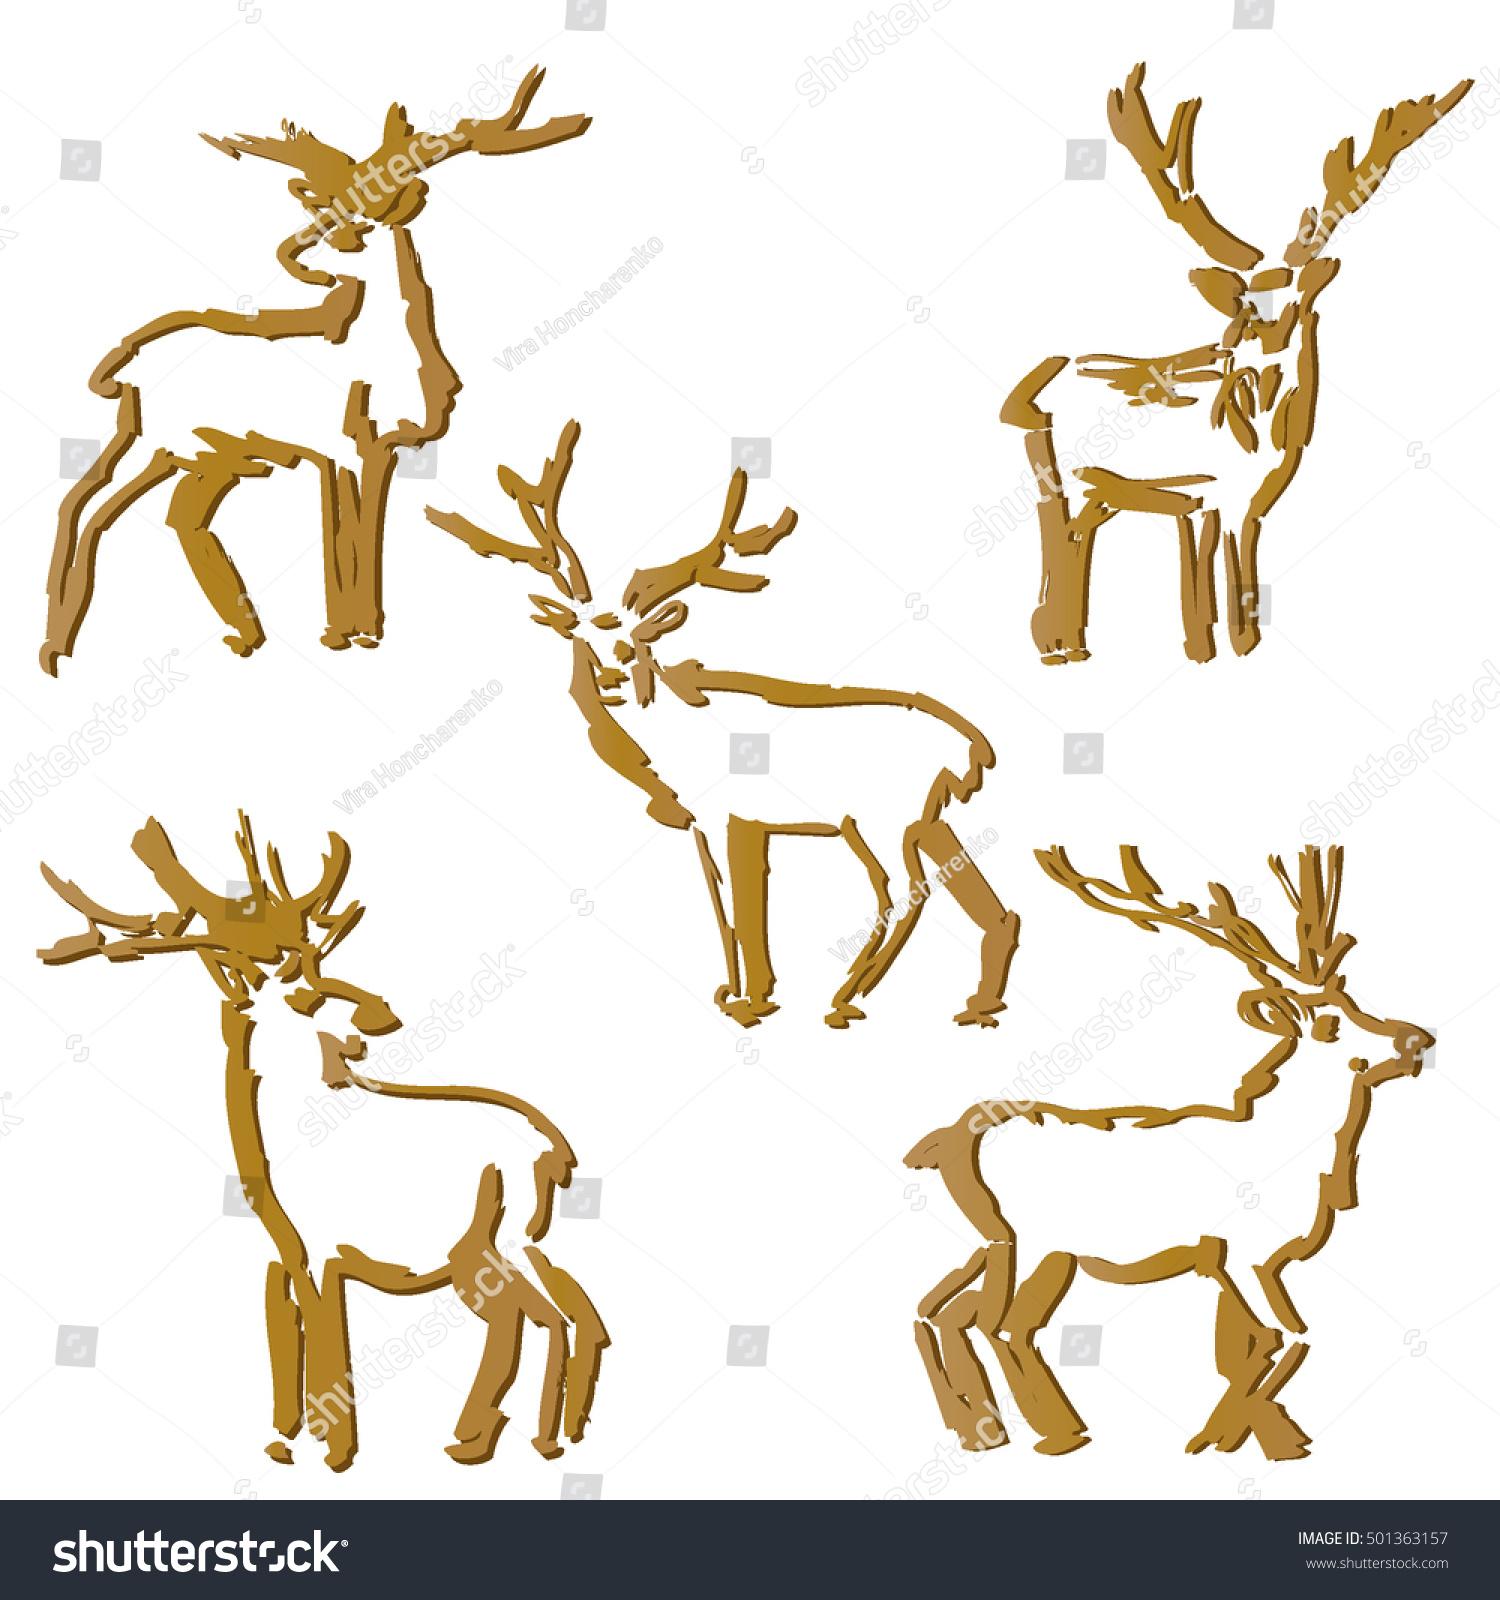 Snow Elk Opt Pack >> Christmas Deer Set Sketches Deer On Stock Vector 501363157 - Shutterstock